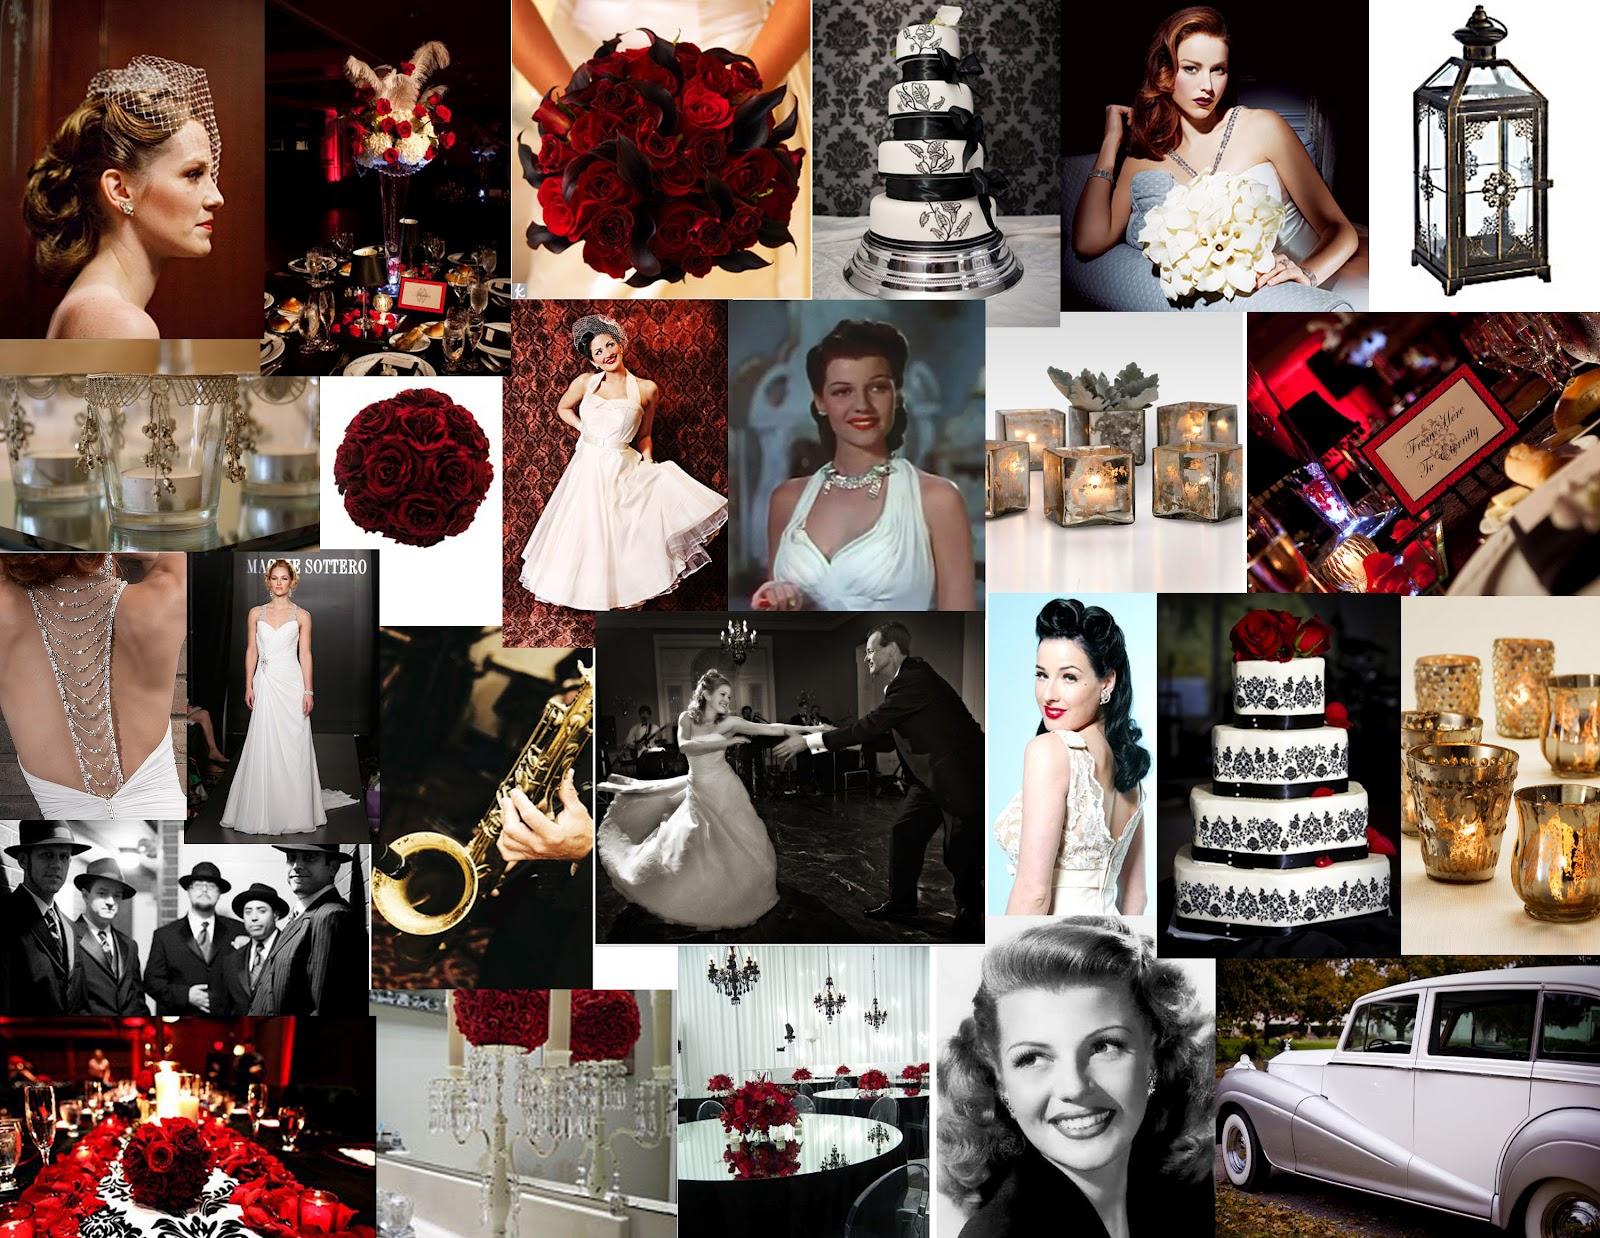 Vintageantique Wedding Theme Any Decor Ideas